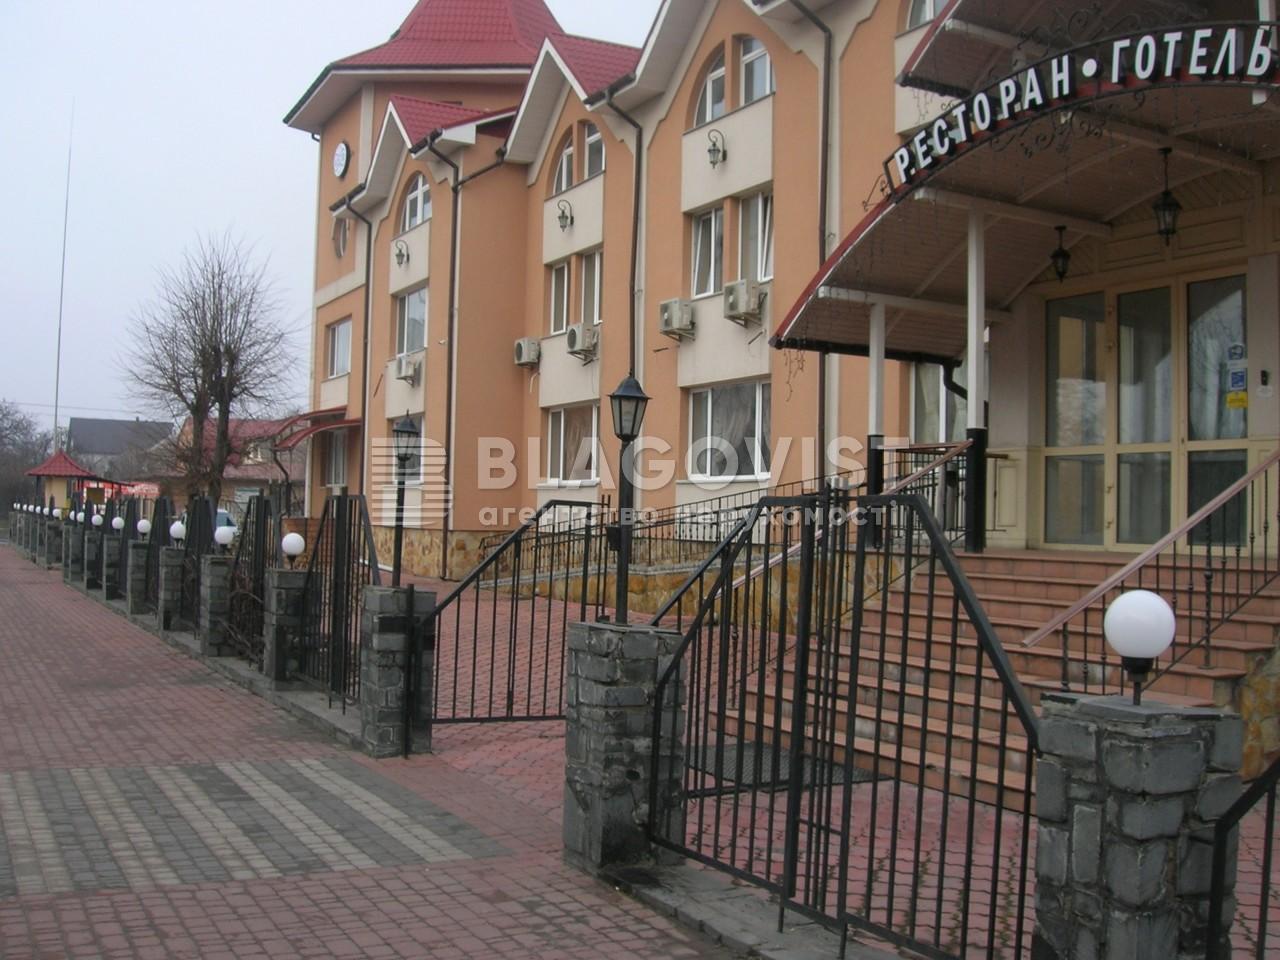 Готель, P-23334, Білгородська, Боярка - Фото 1